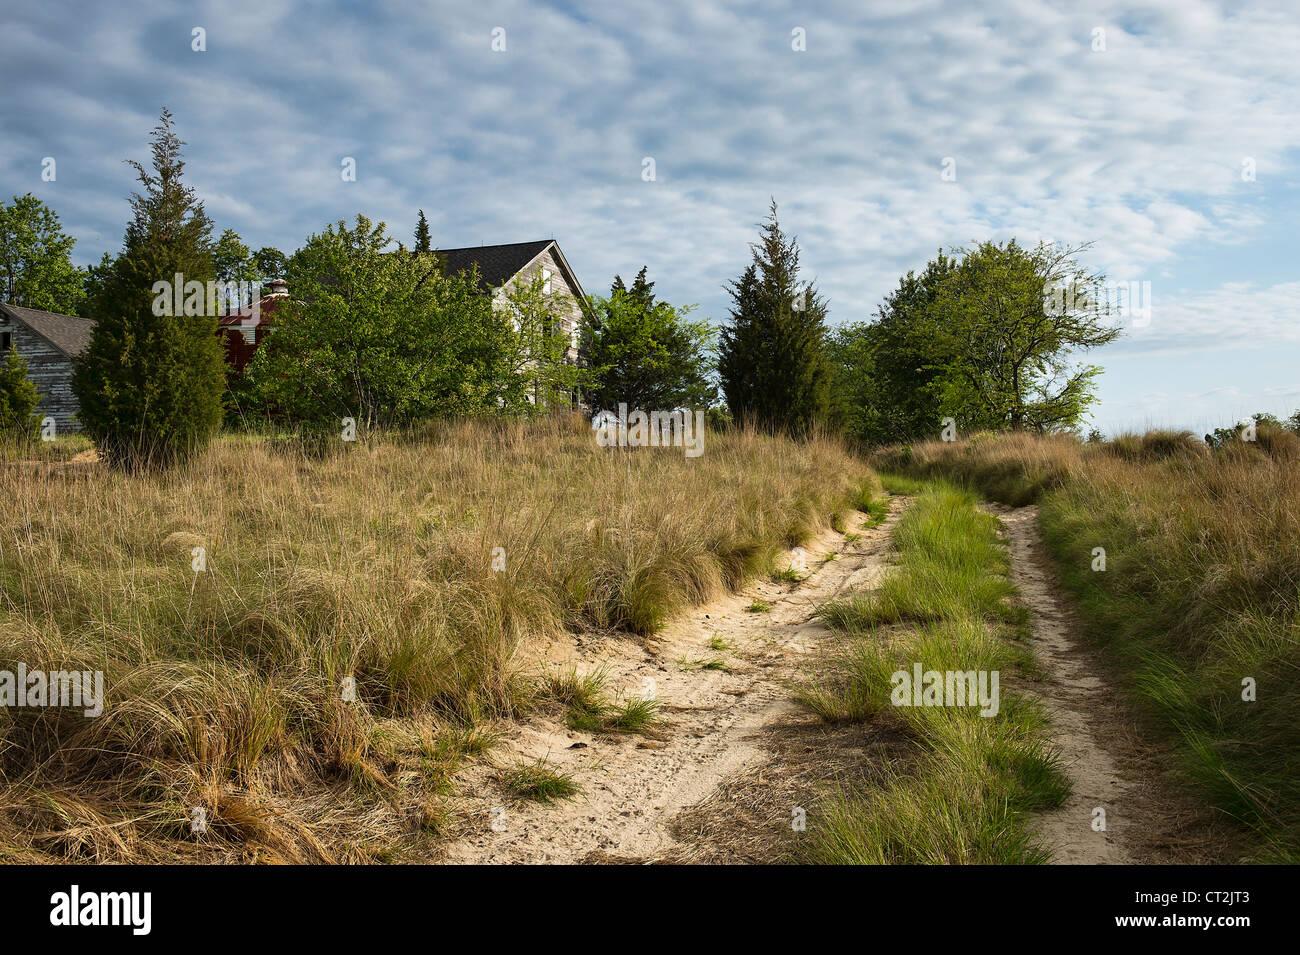 Abandoned rural farm house. - Stock Image